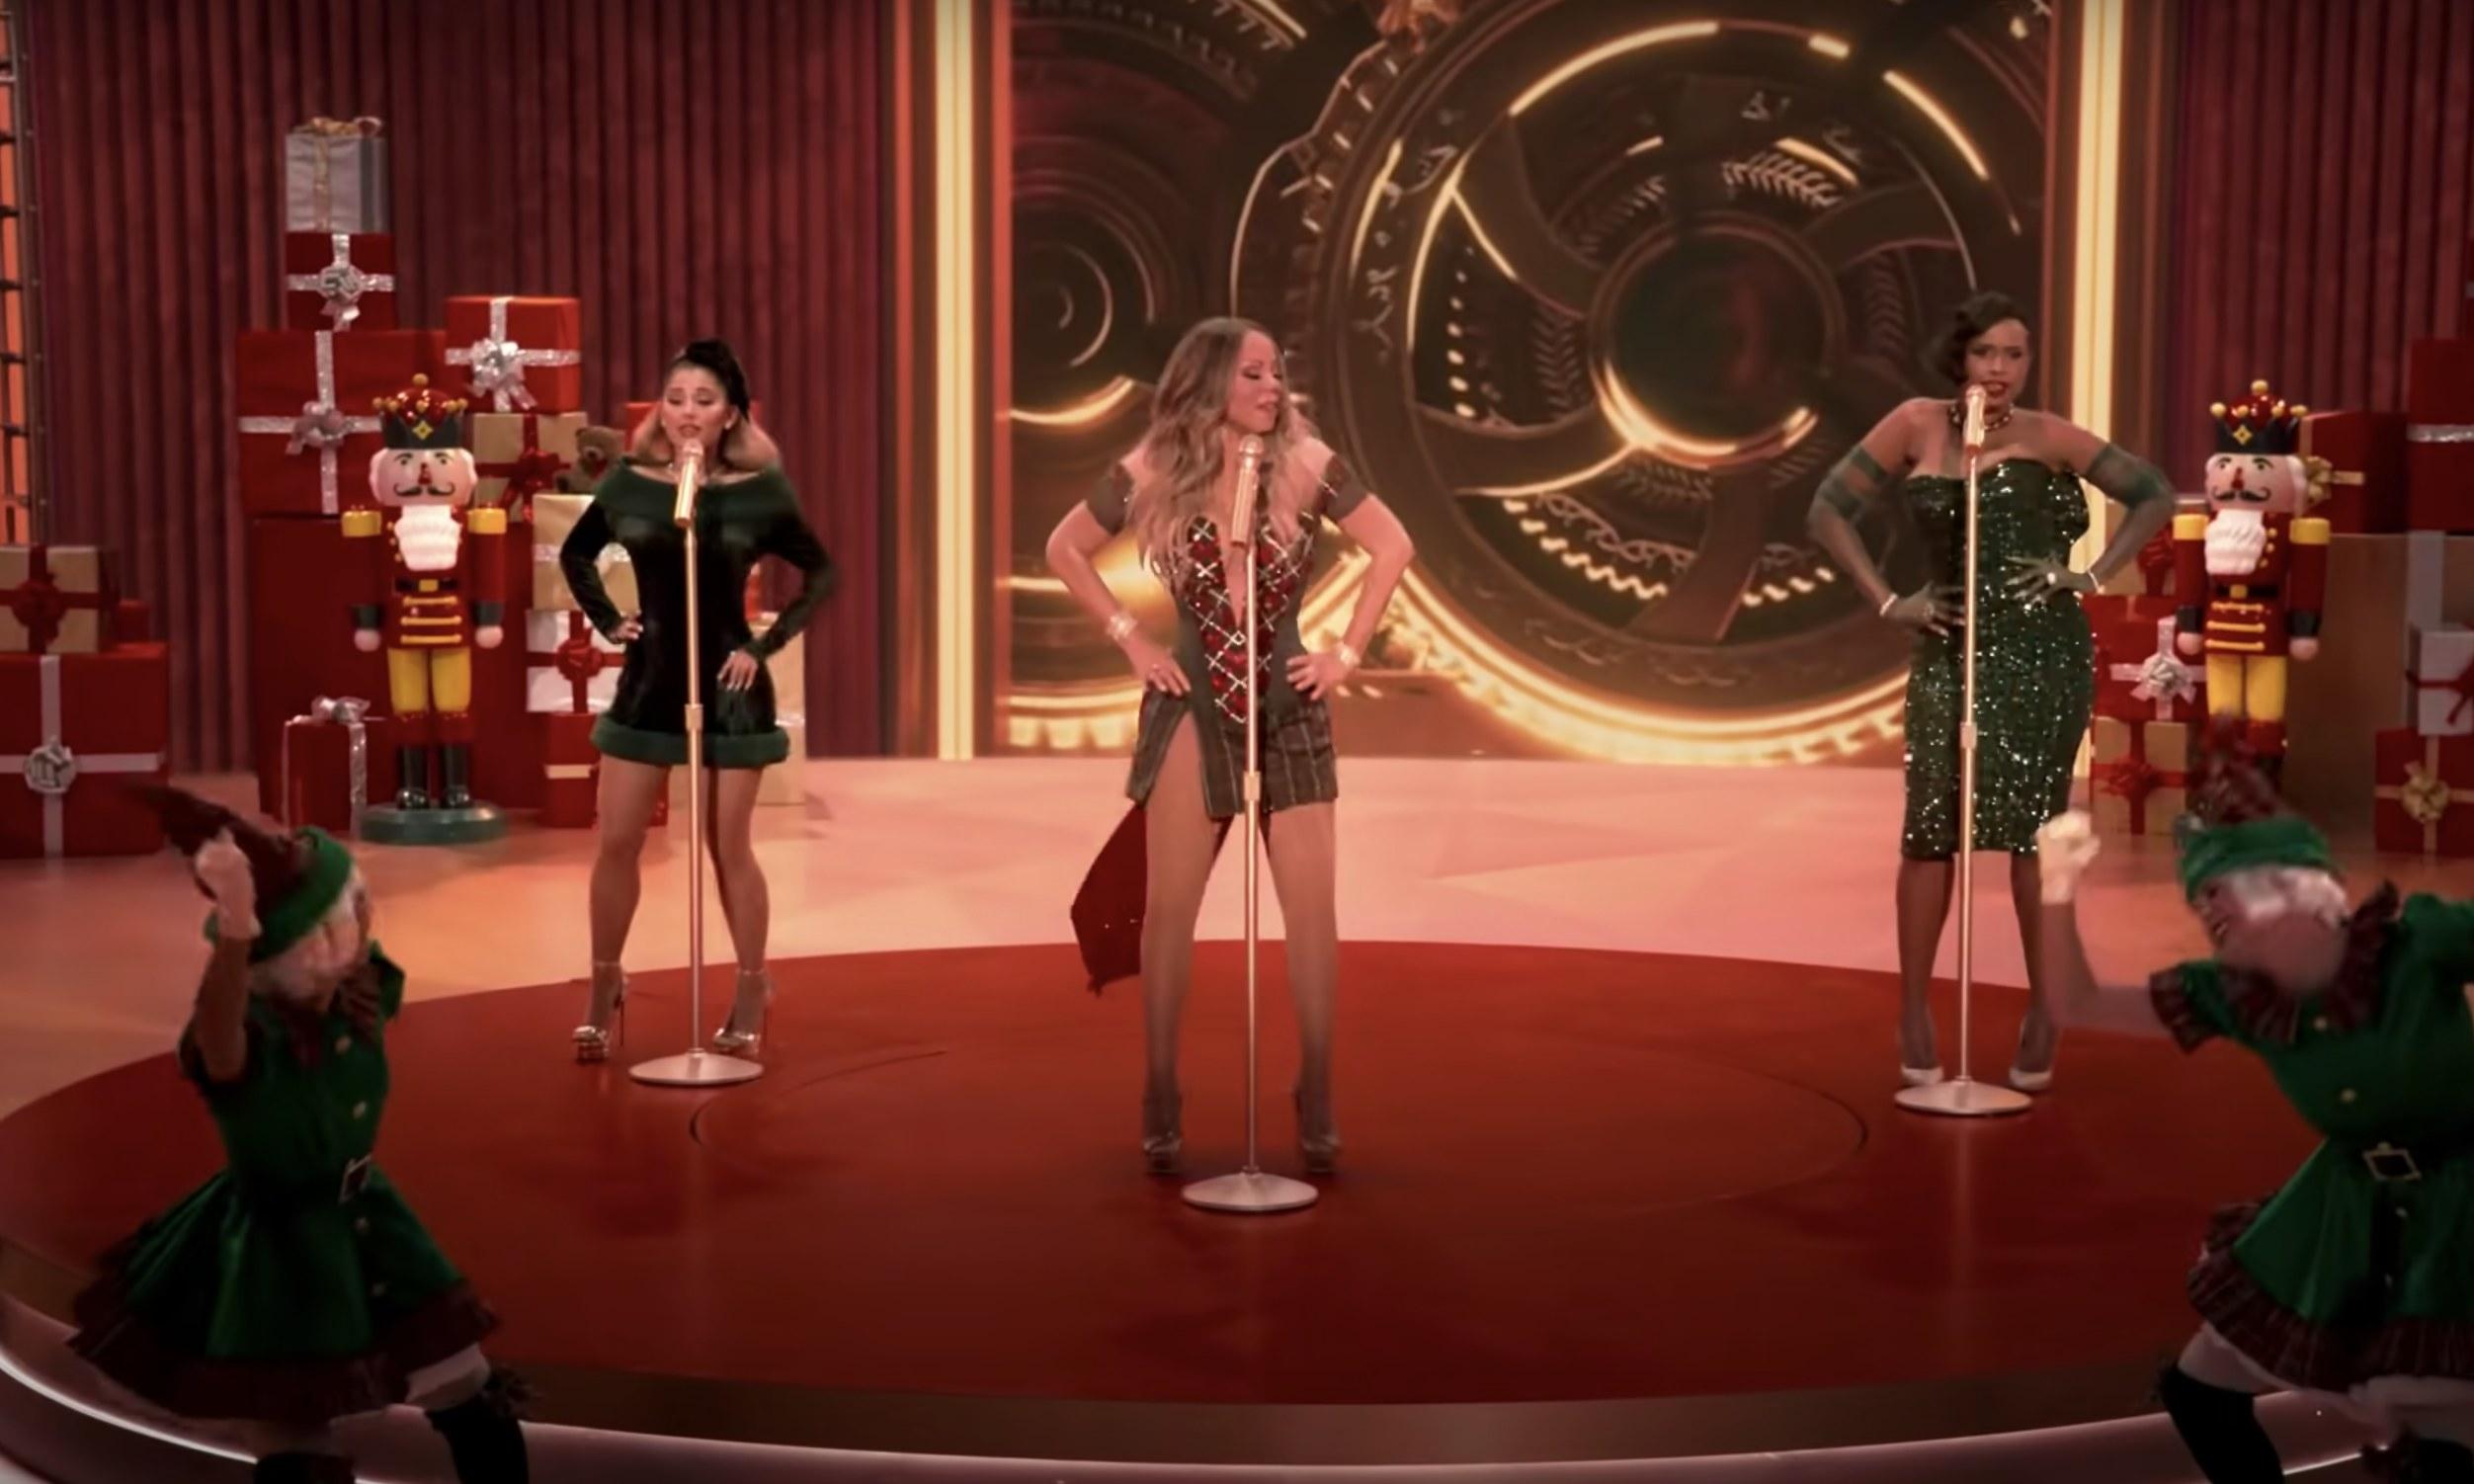 Mariah Carey, Ariana Grande, and Jennifer Hudson singing